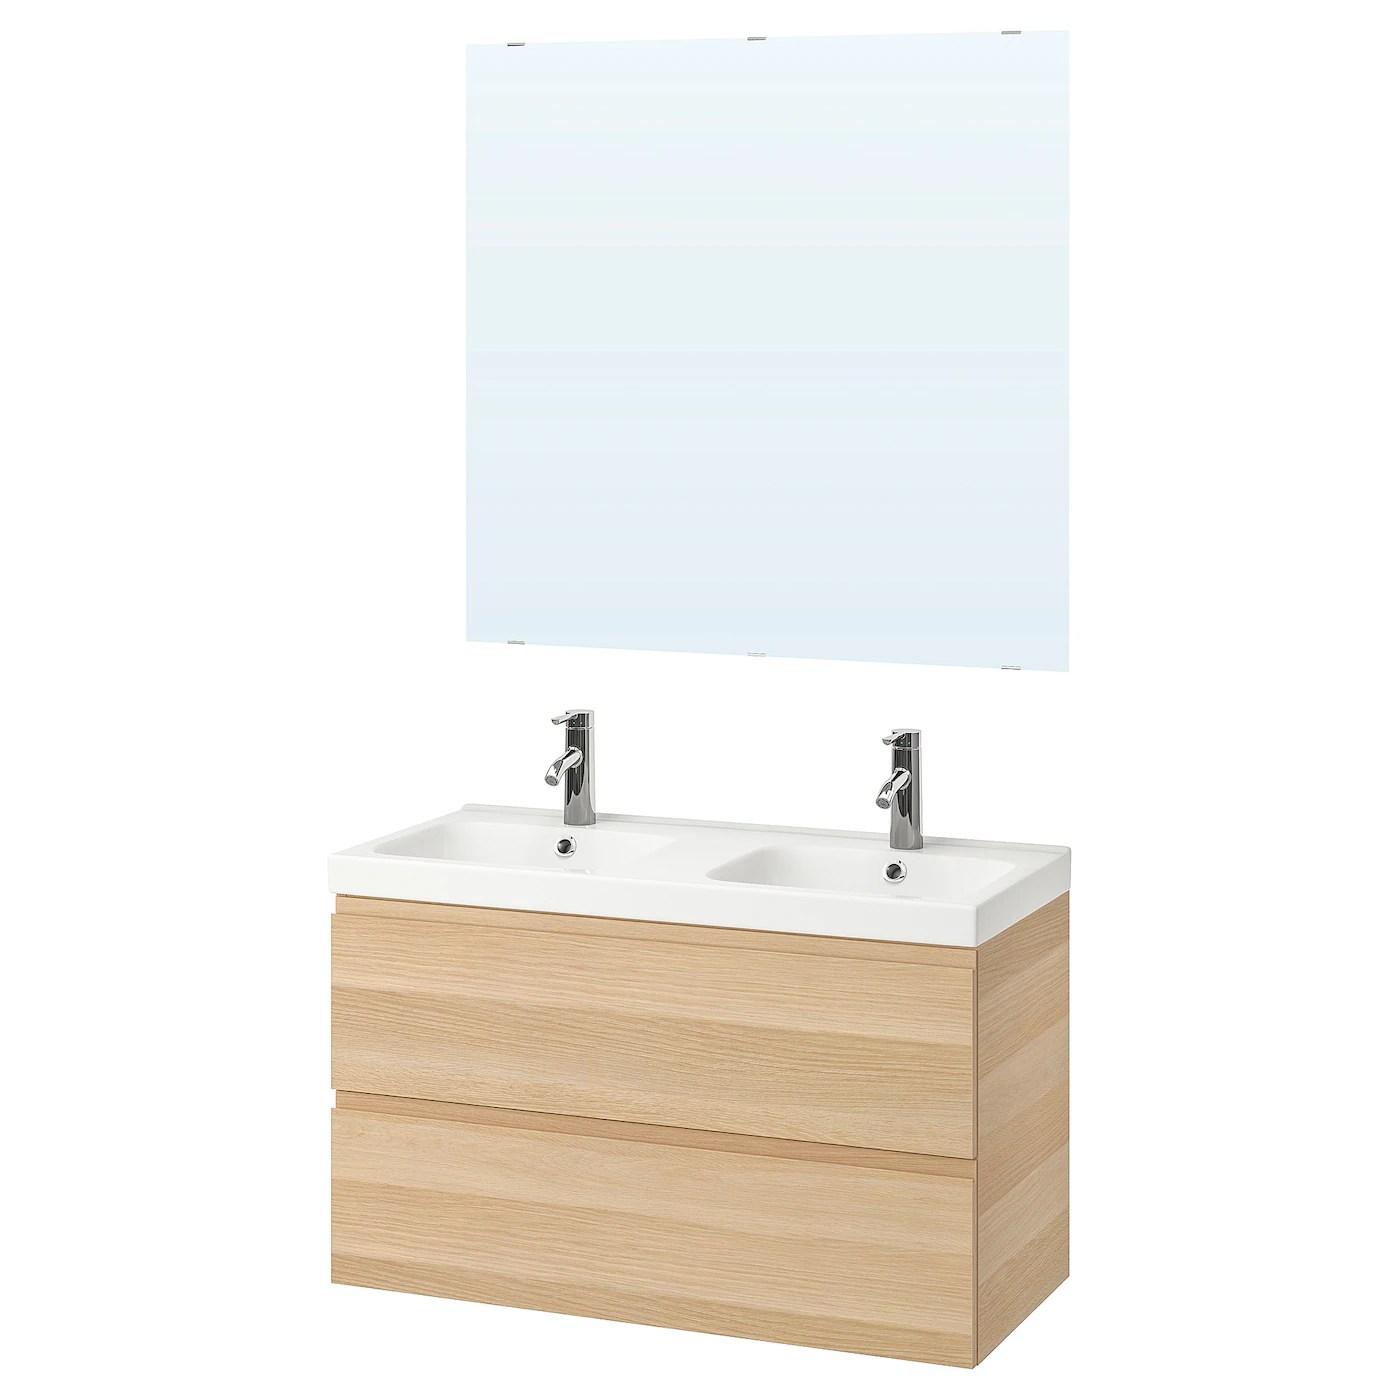 Godmorgon Odensvik Mobilier Salle De Bain 5 Pieces Effet Chene Blanchi Dalskar Mitigeur Lavabo Ikea Suisse